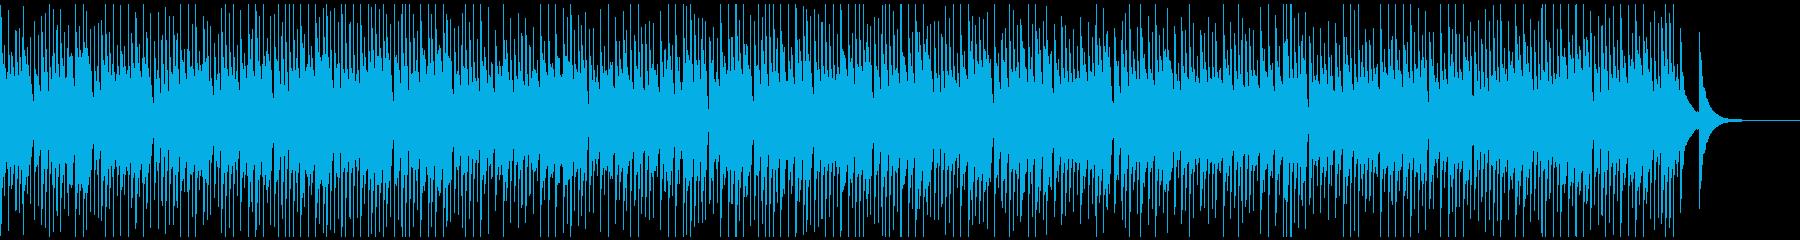 CMや映像に のんびり優しさがある空間像の再生済みの波形